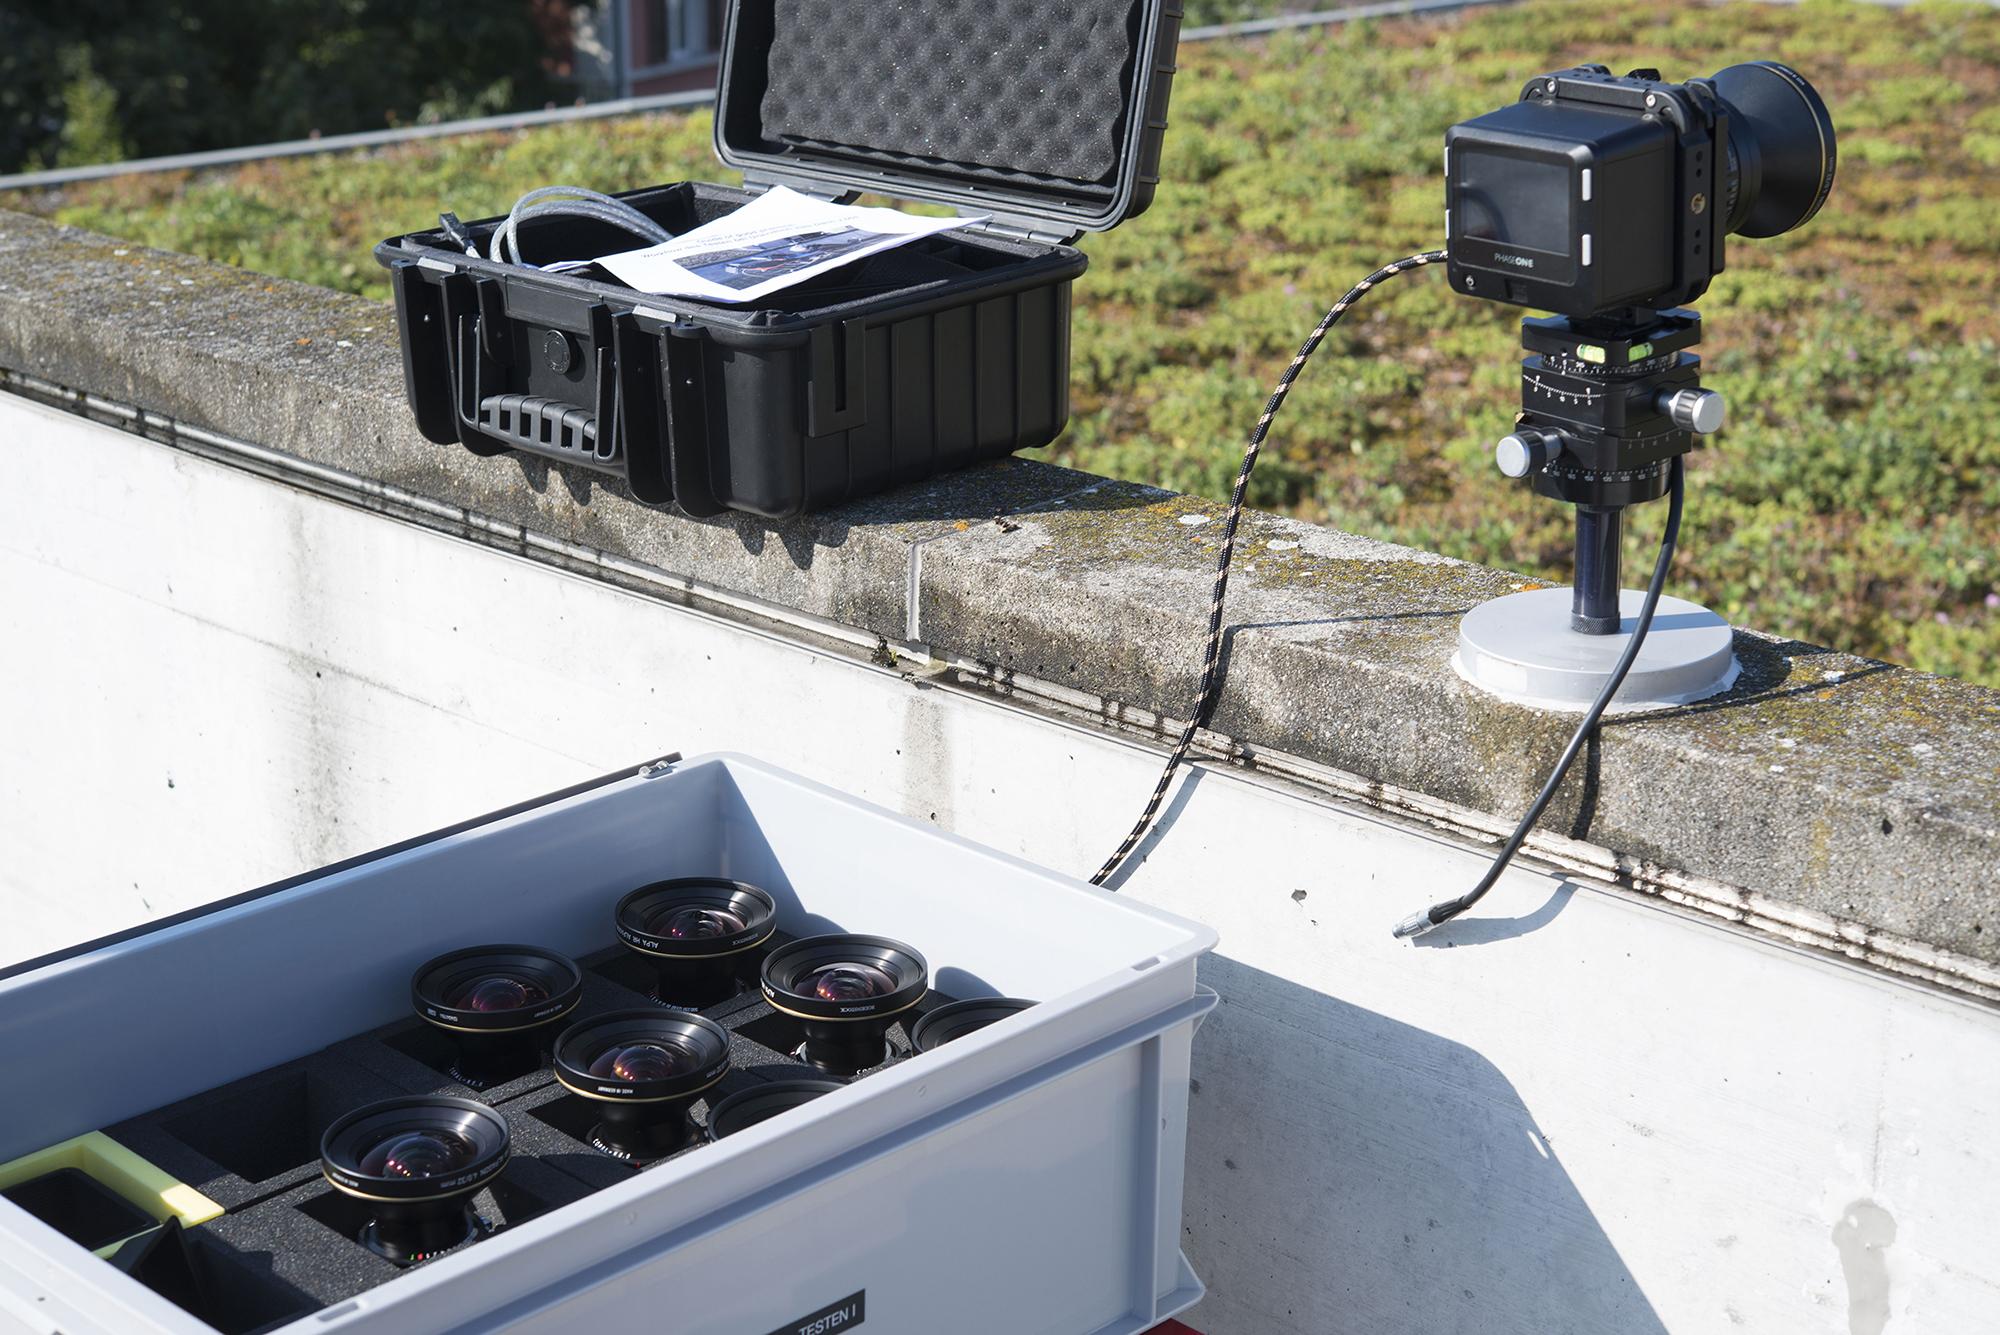 Not just random samples: ALPA thoroughly checks every single lens delivery.